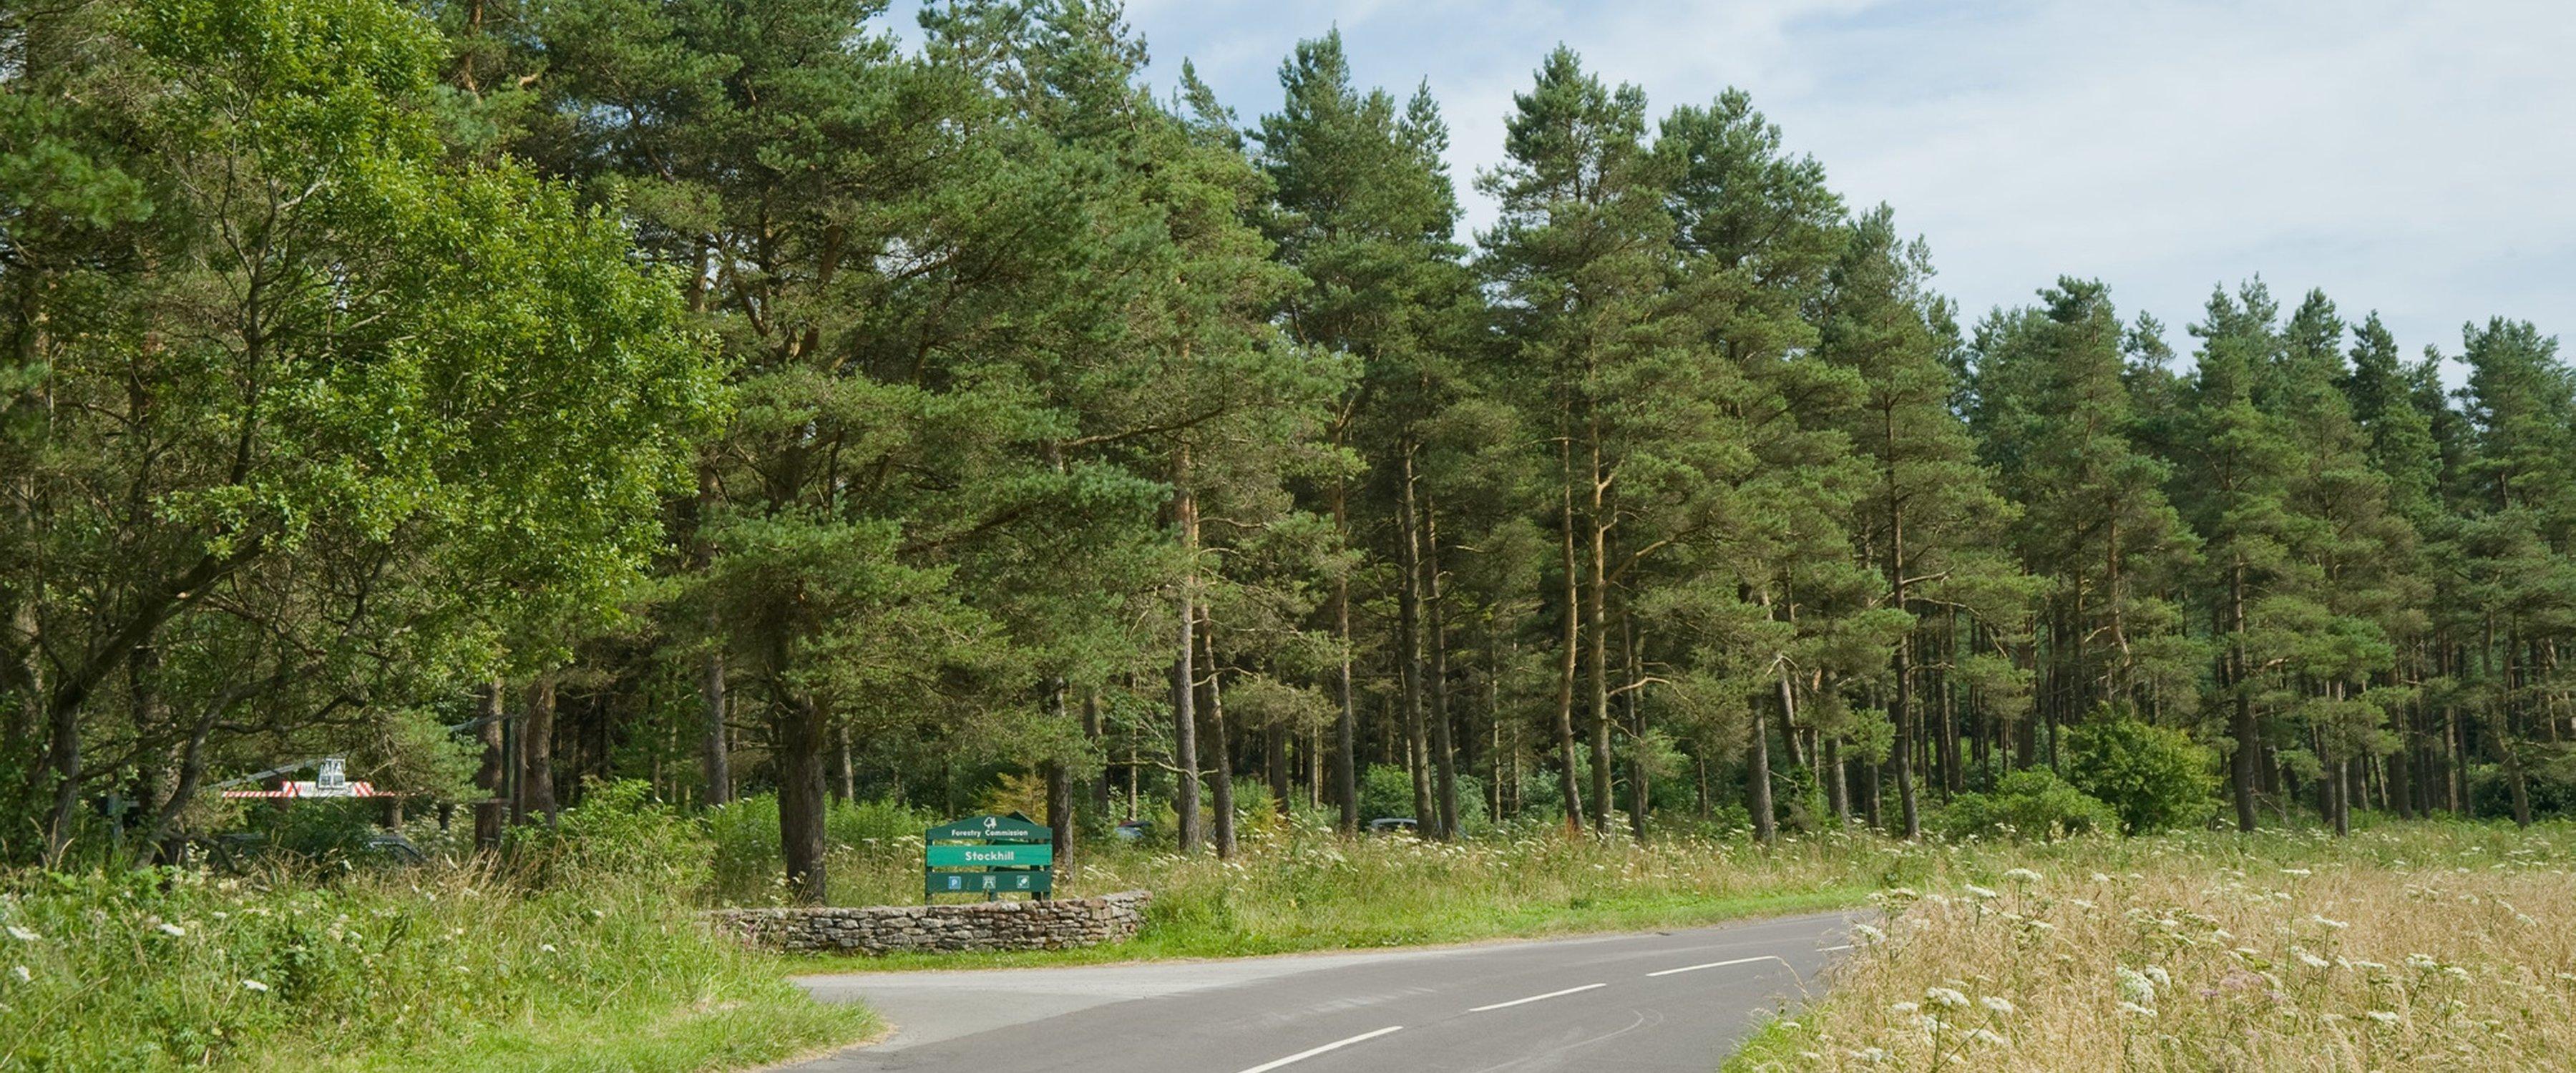 Stockhill Wood